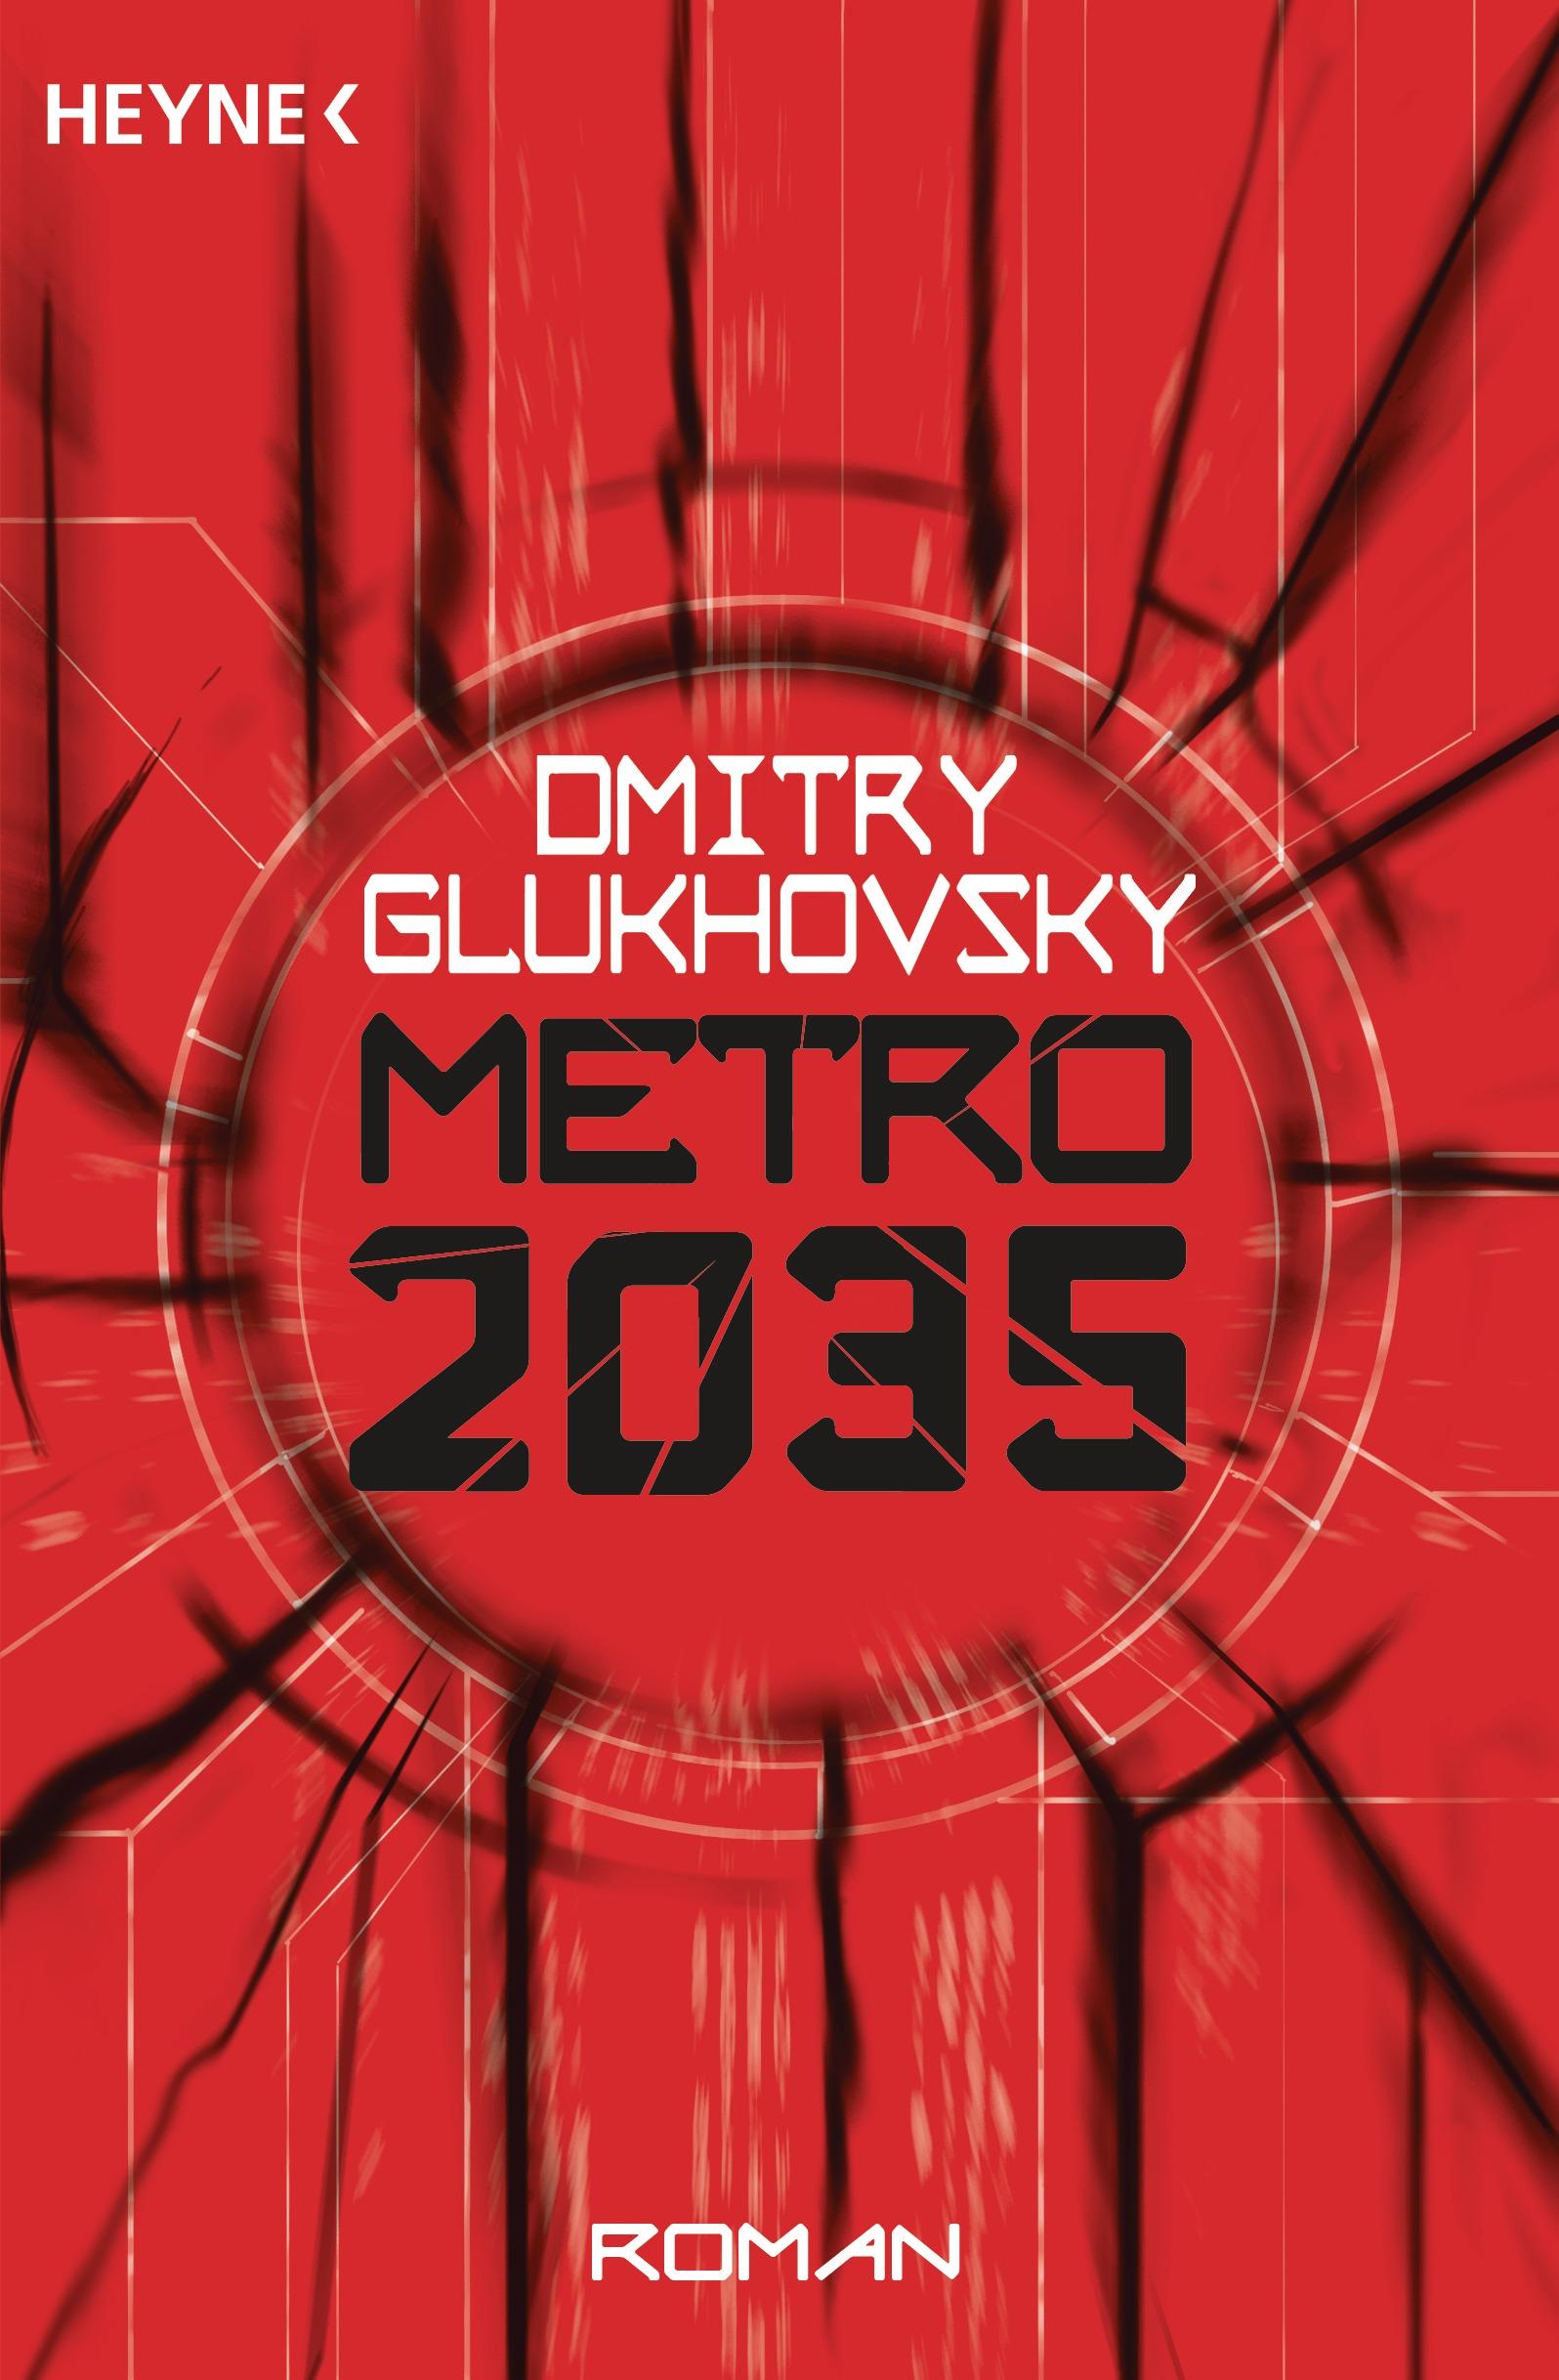 Metro 2035: Roman (2016, Heyne Verlag)